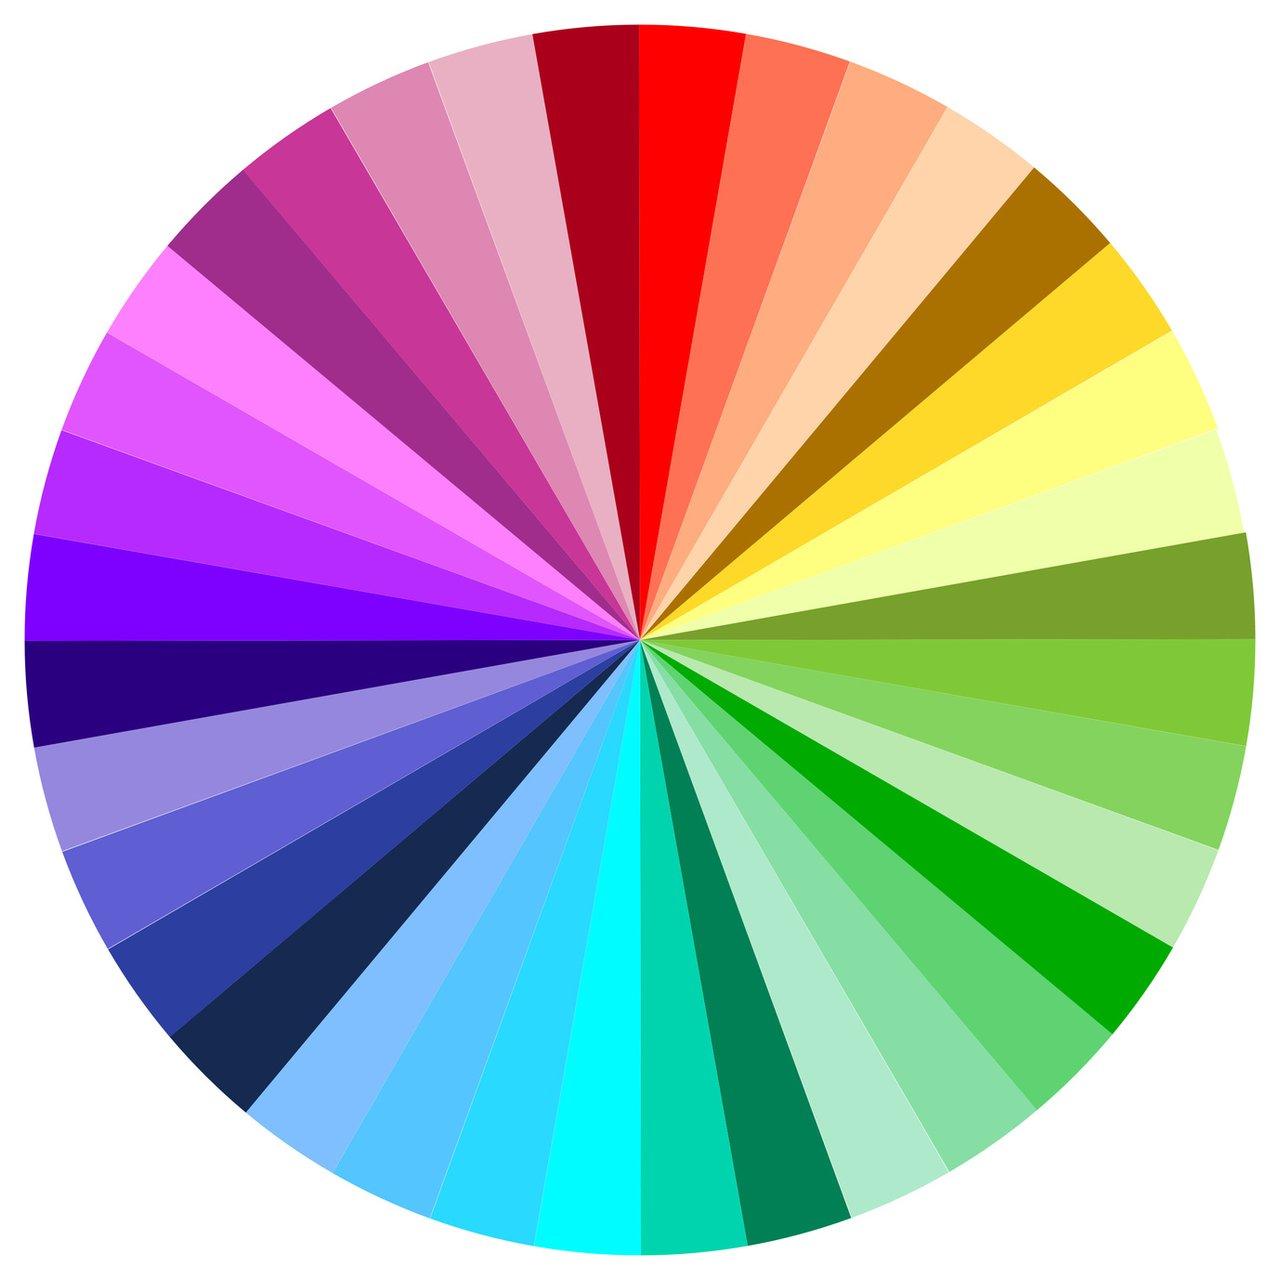 Welche Farbe Soll Es Sein?